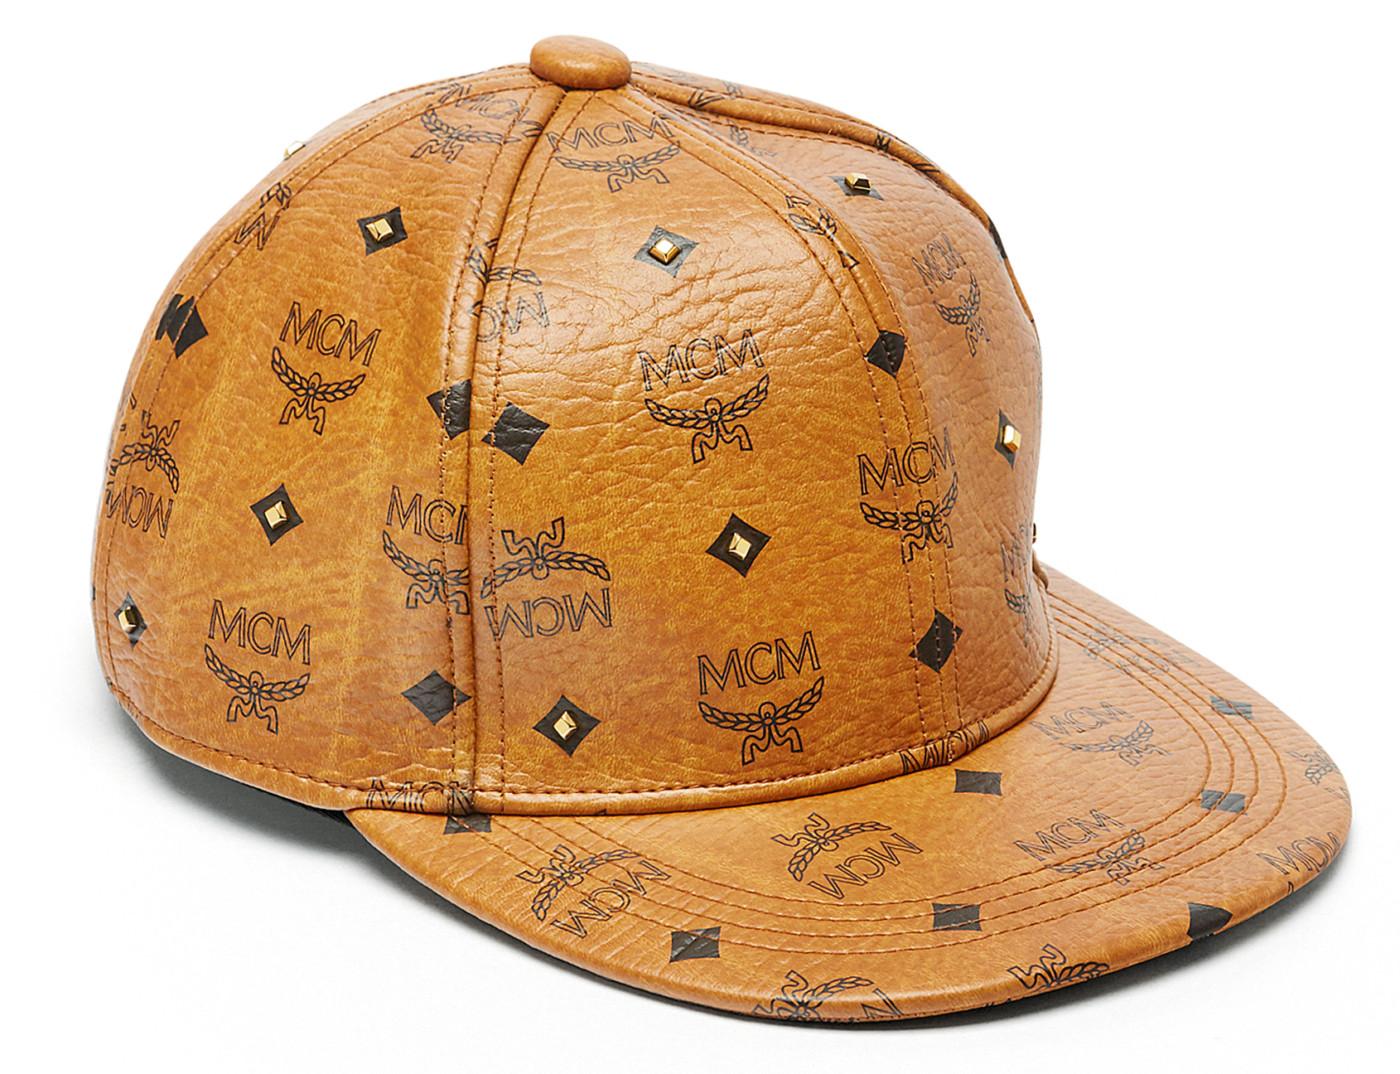 0bed568f8d1ab MCM Cognac 24K Gold Stud Visetose Baseball Cap Hat